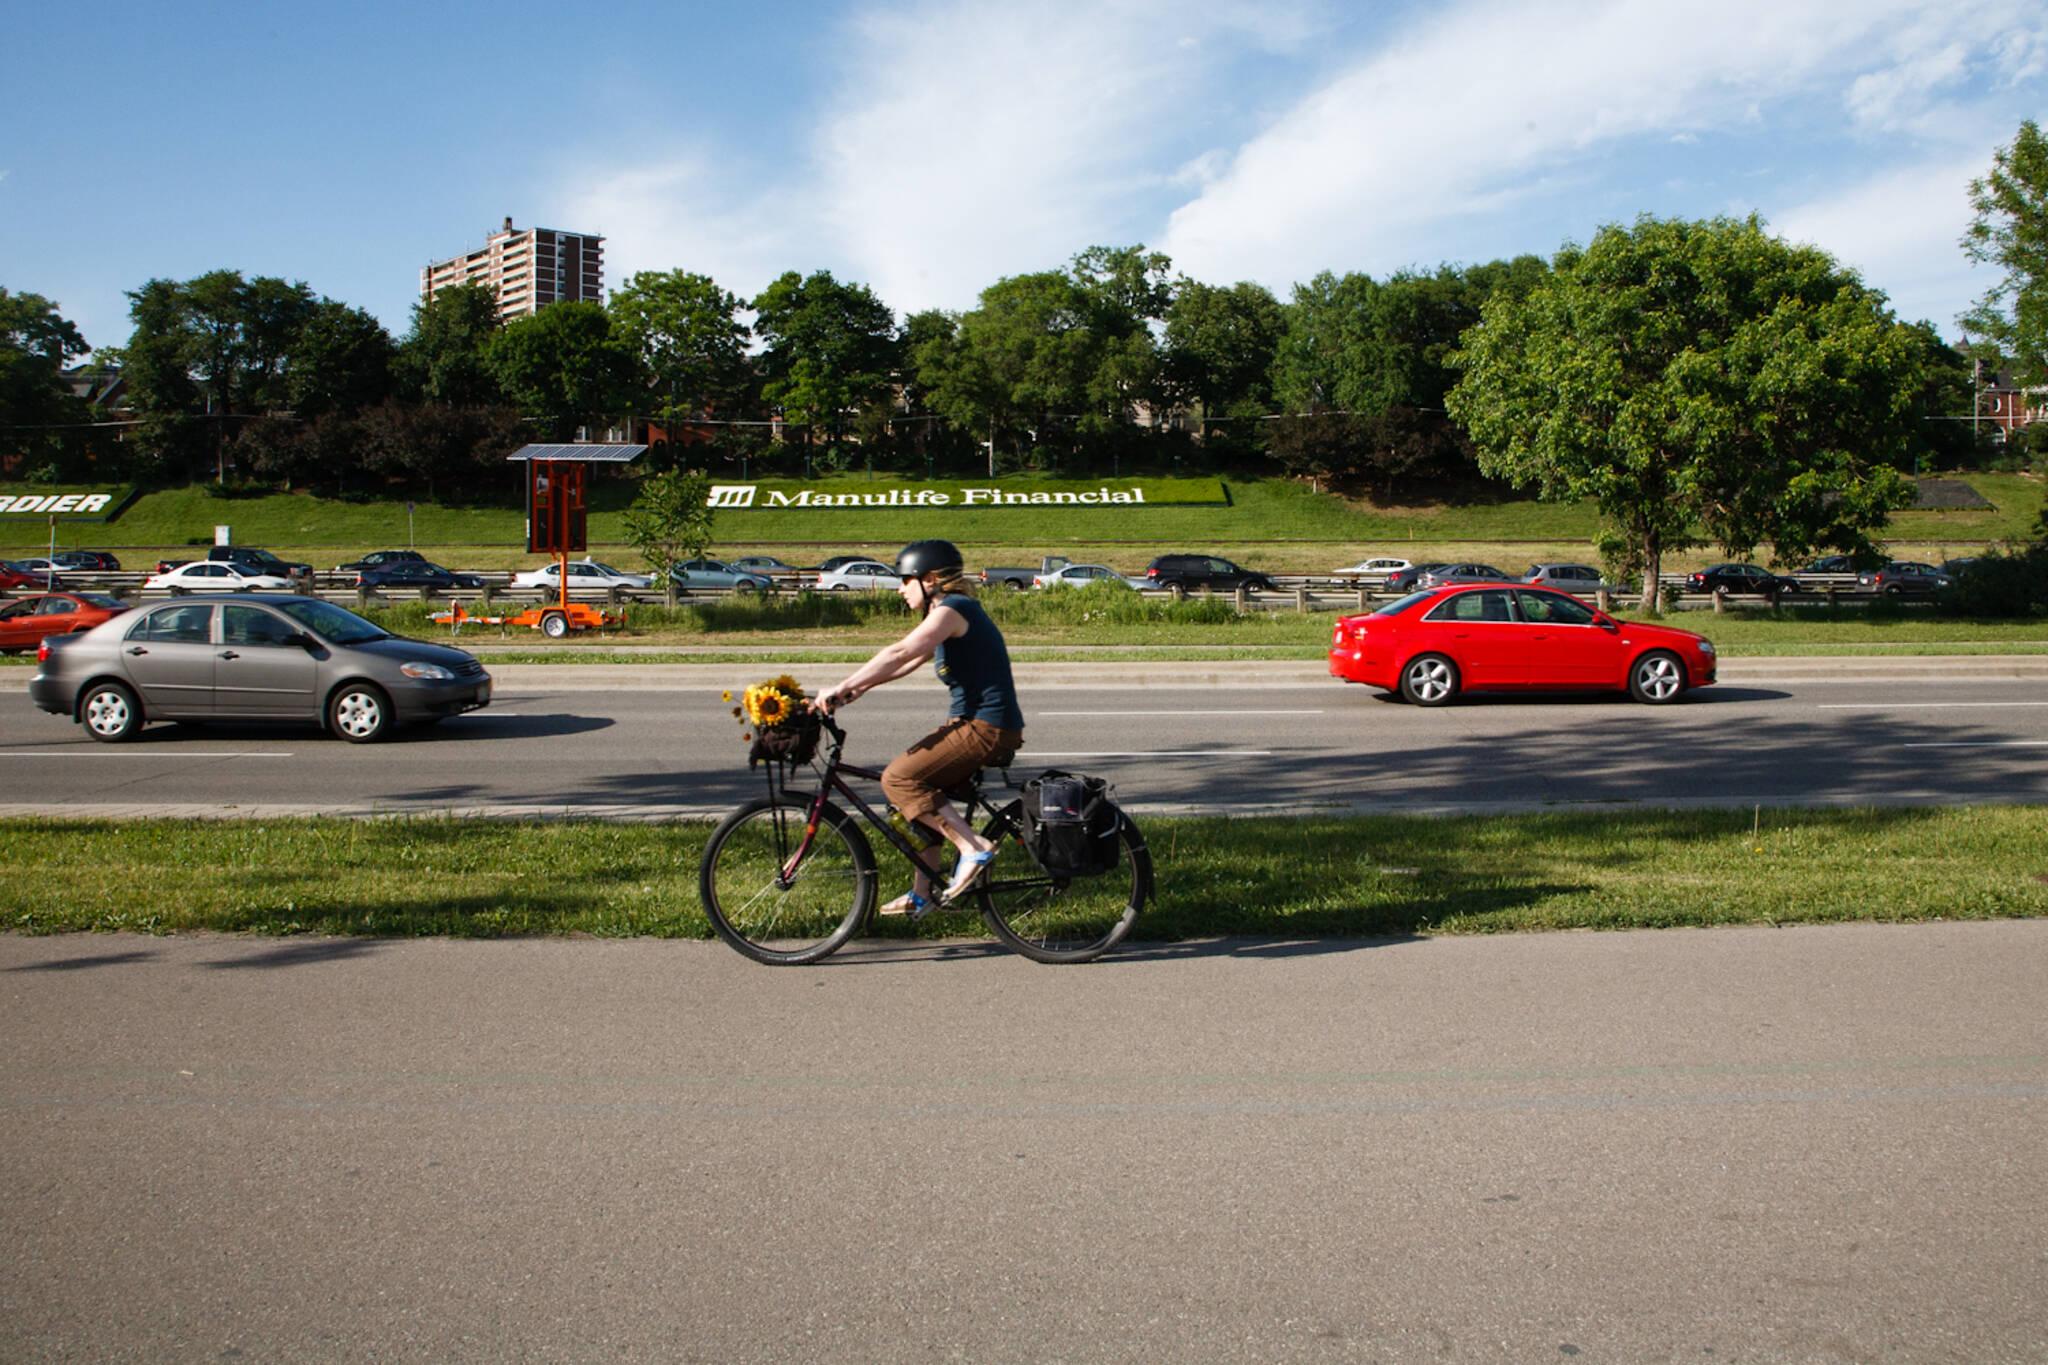 lakeshore bike lanes toronto